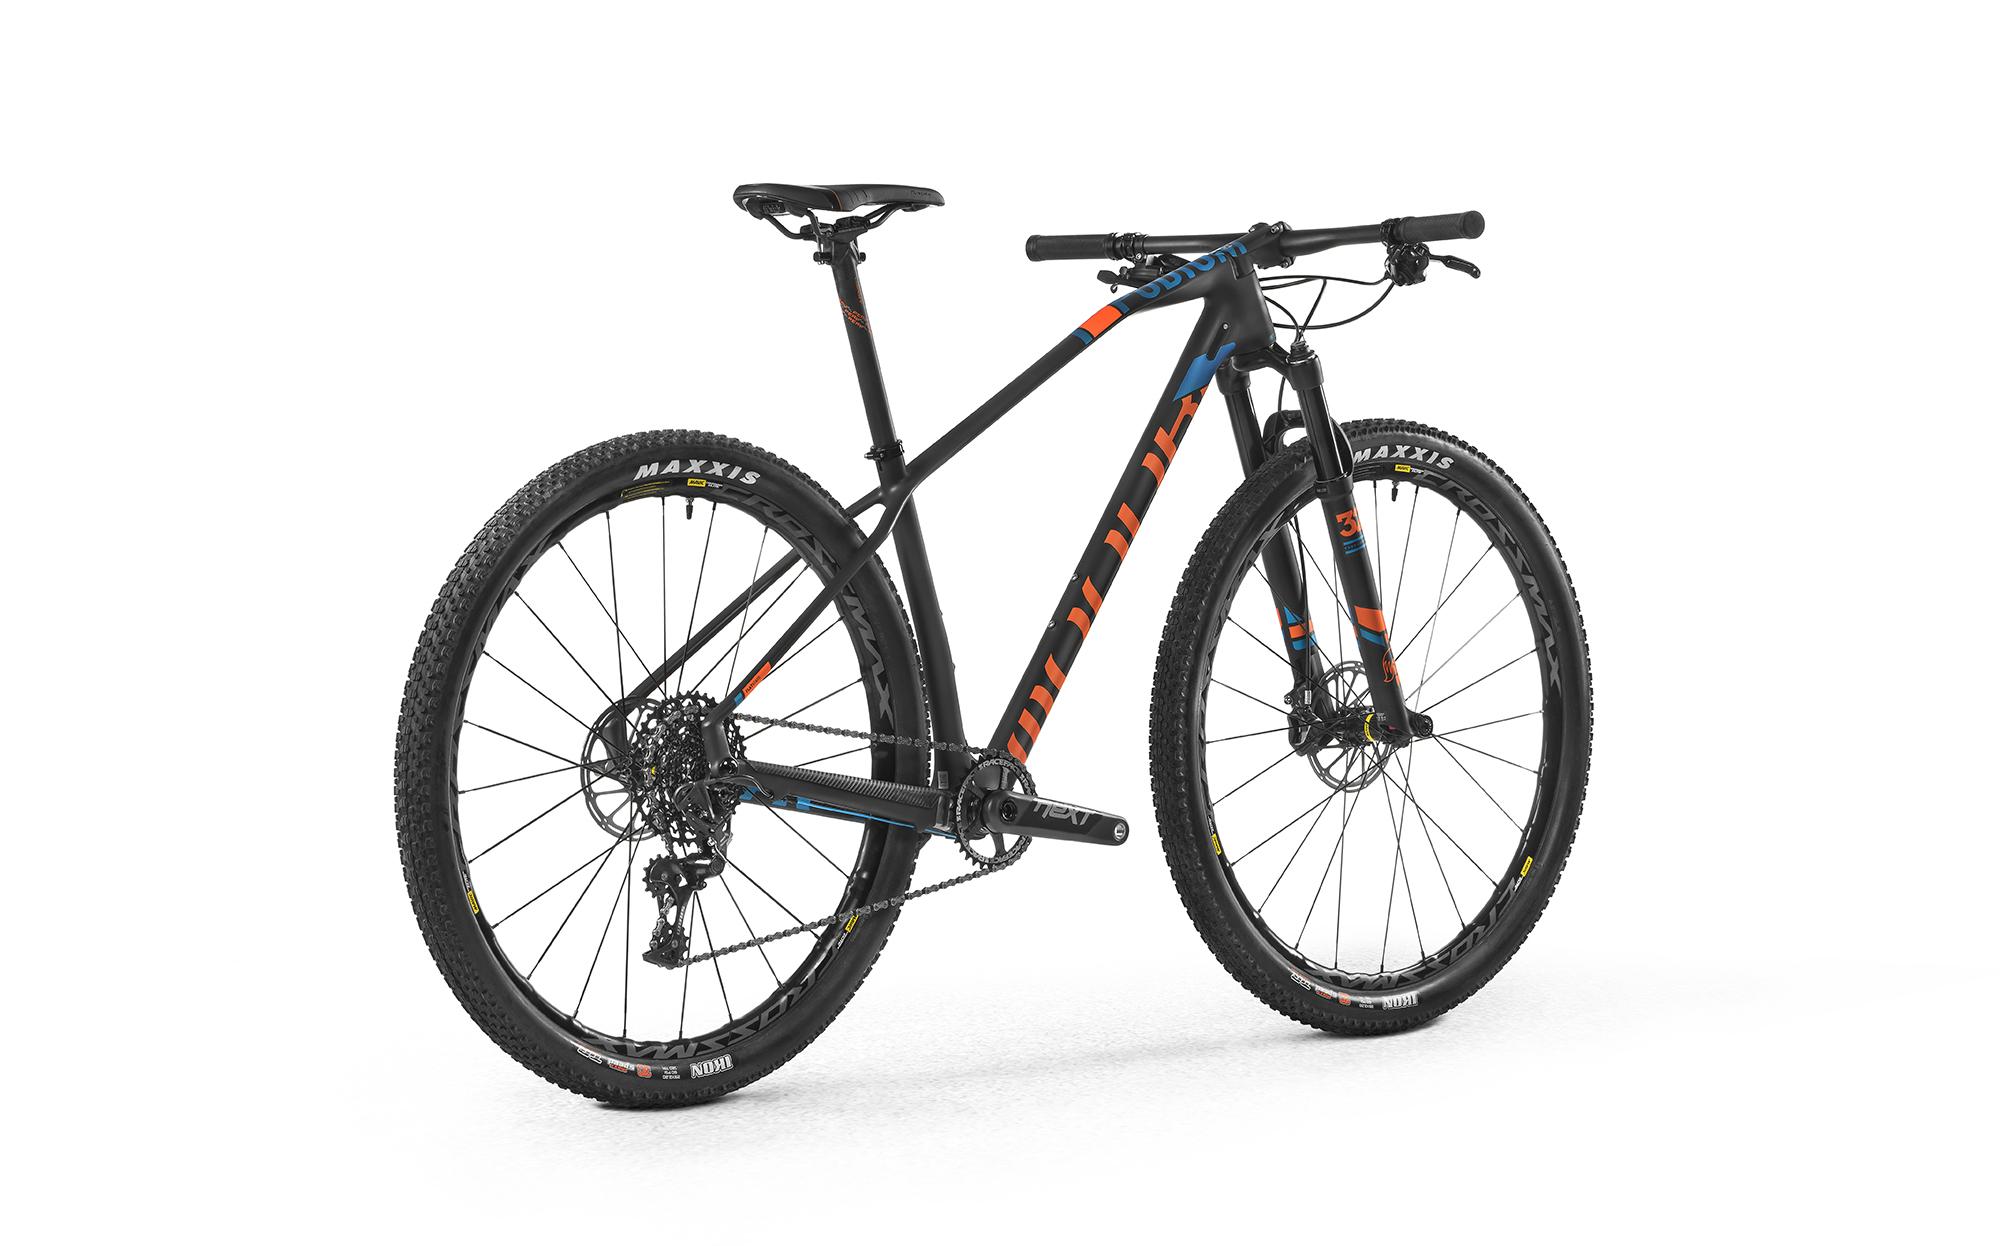 Mondraker Podium R Carbon 29er Hardtail Cross Country Race Mountain Bike